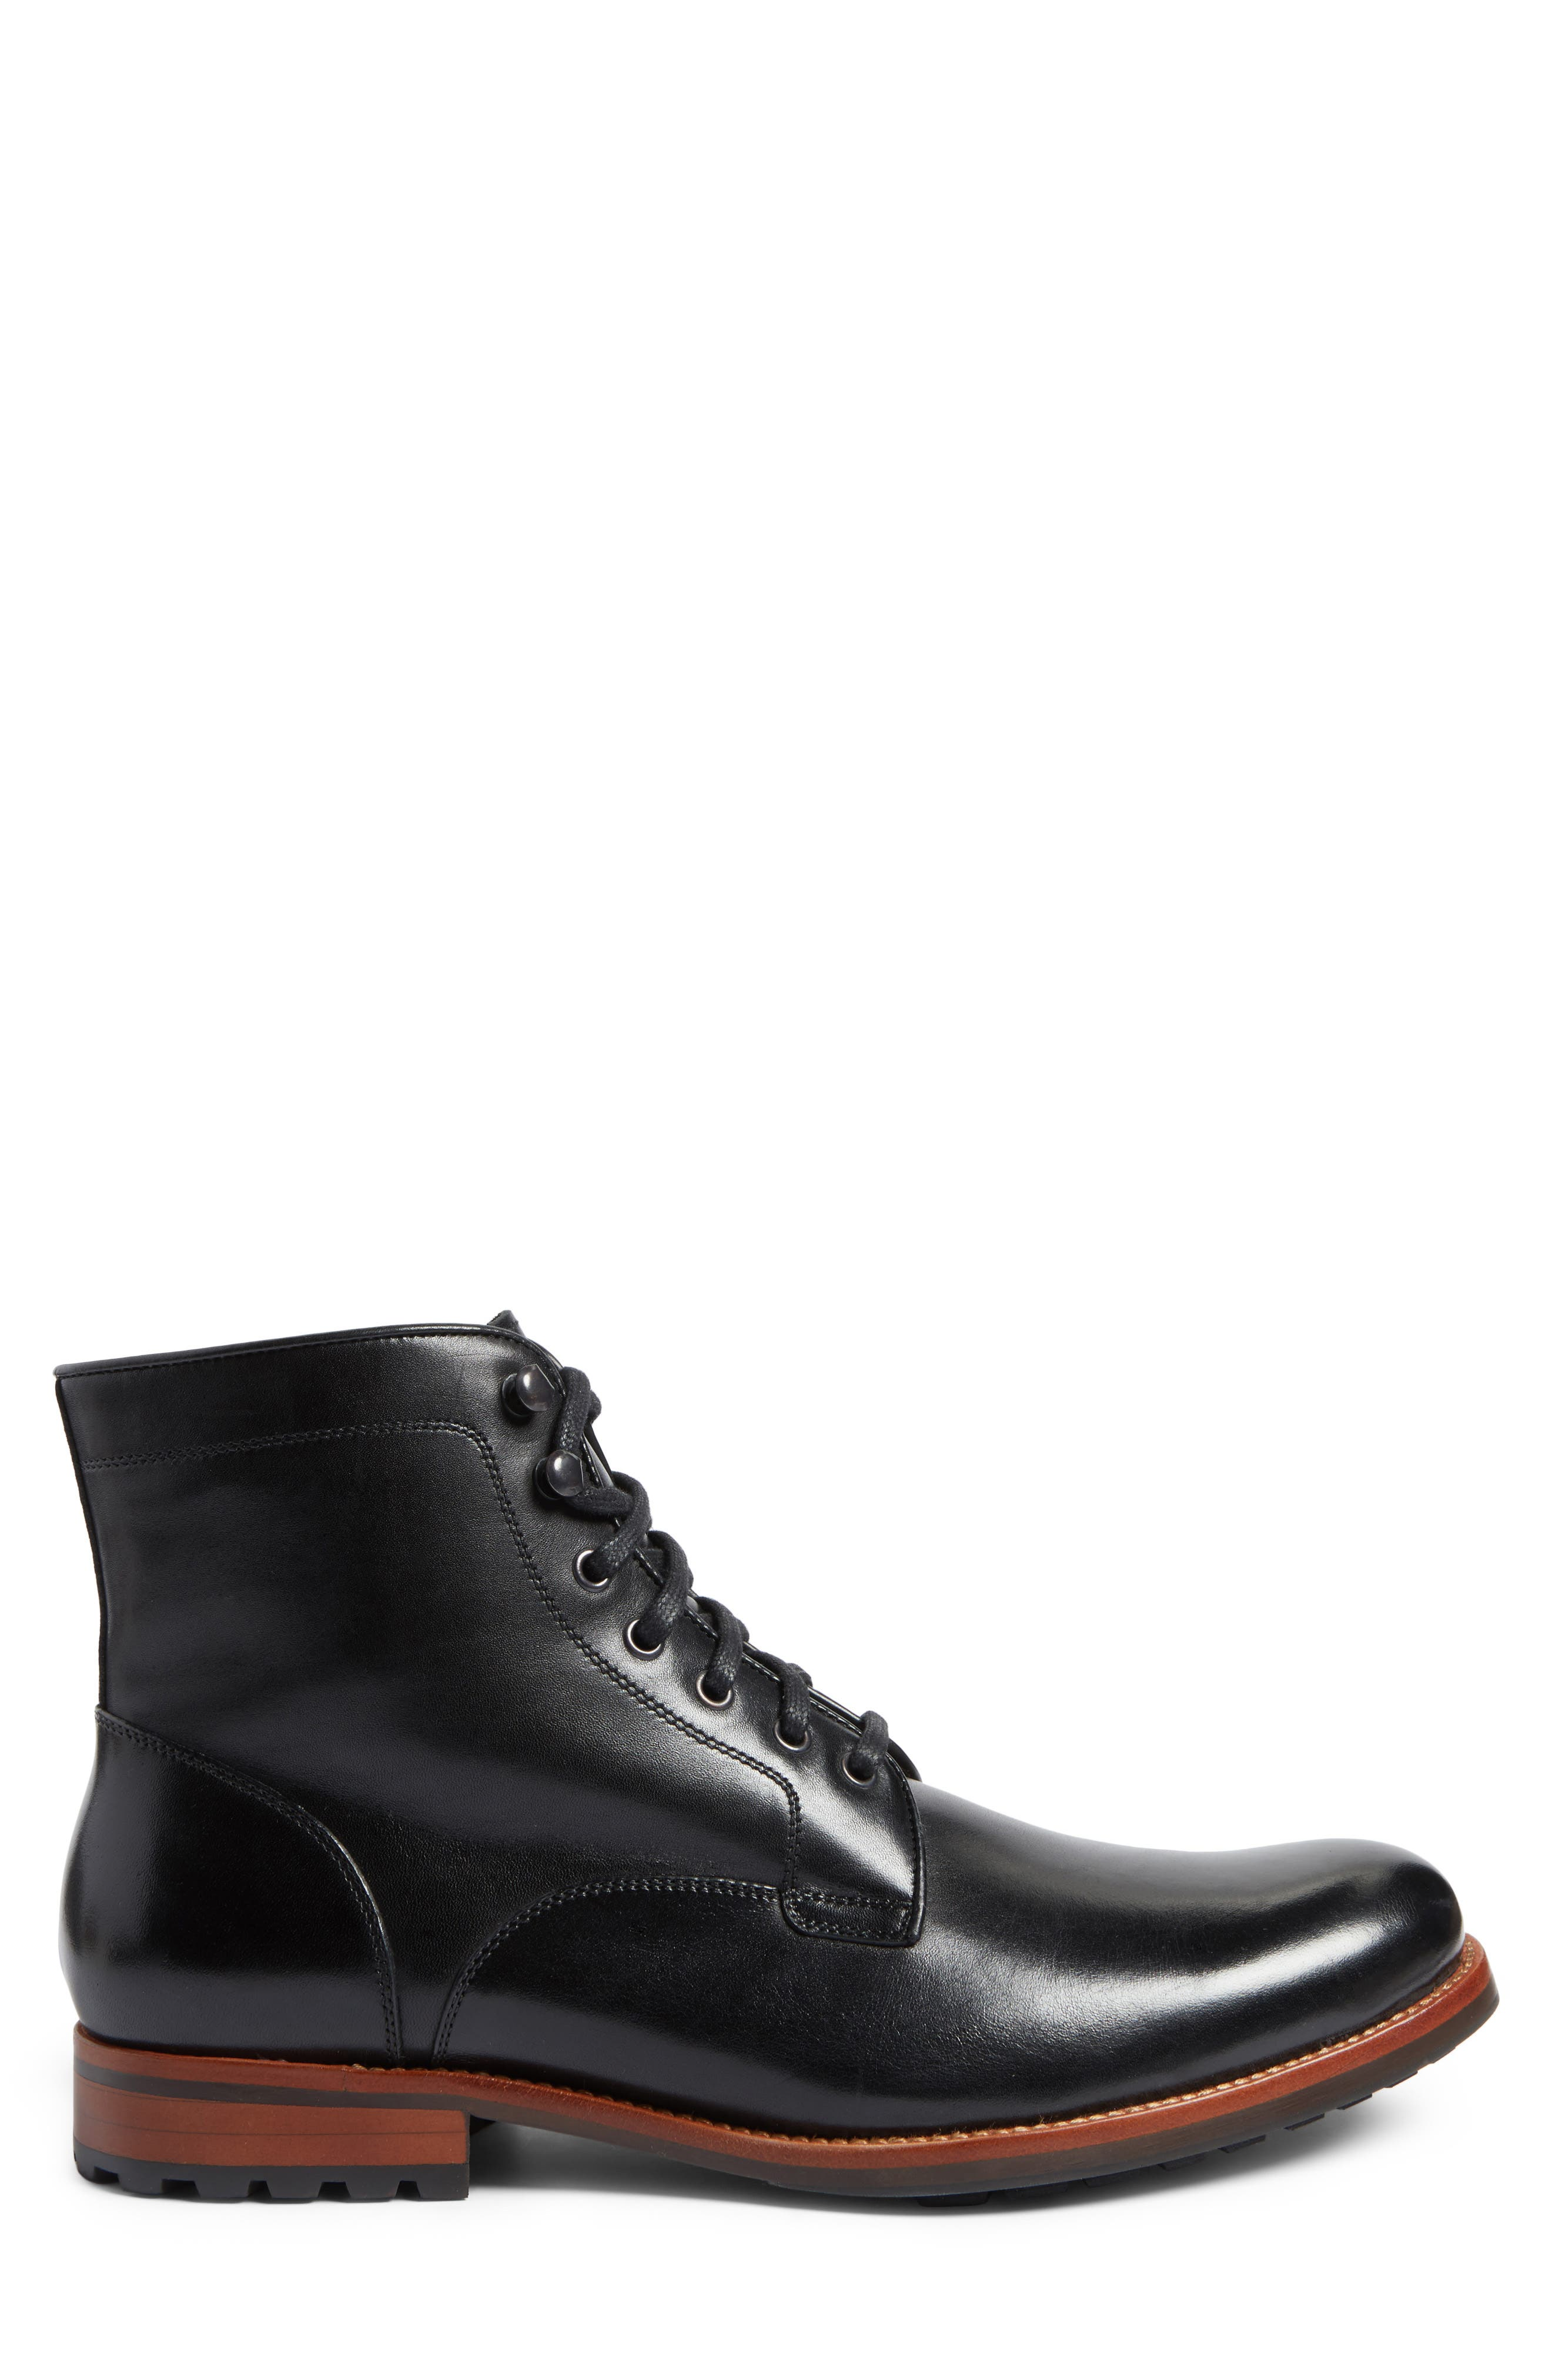 Axeford Plain Toe Boot,                             Alternate thumbnail 3, color,                             001